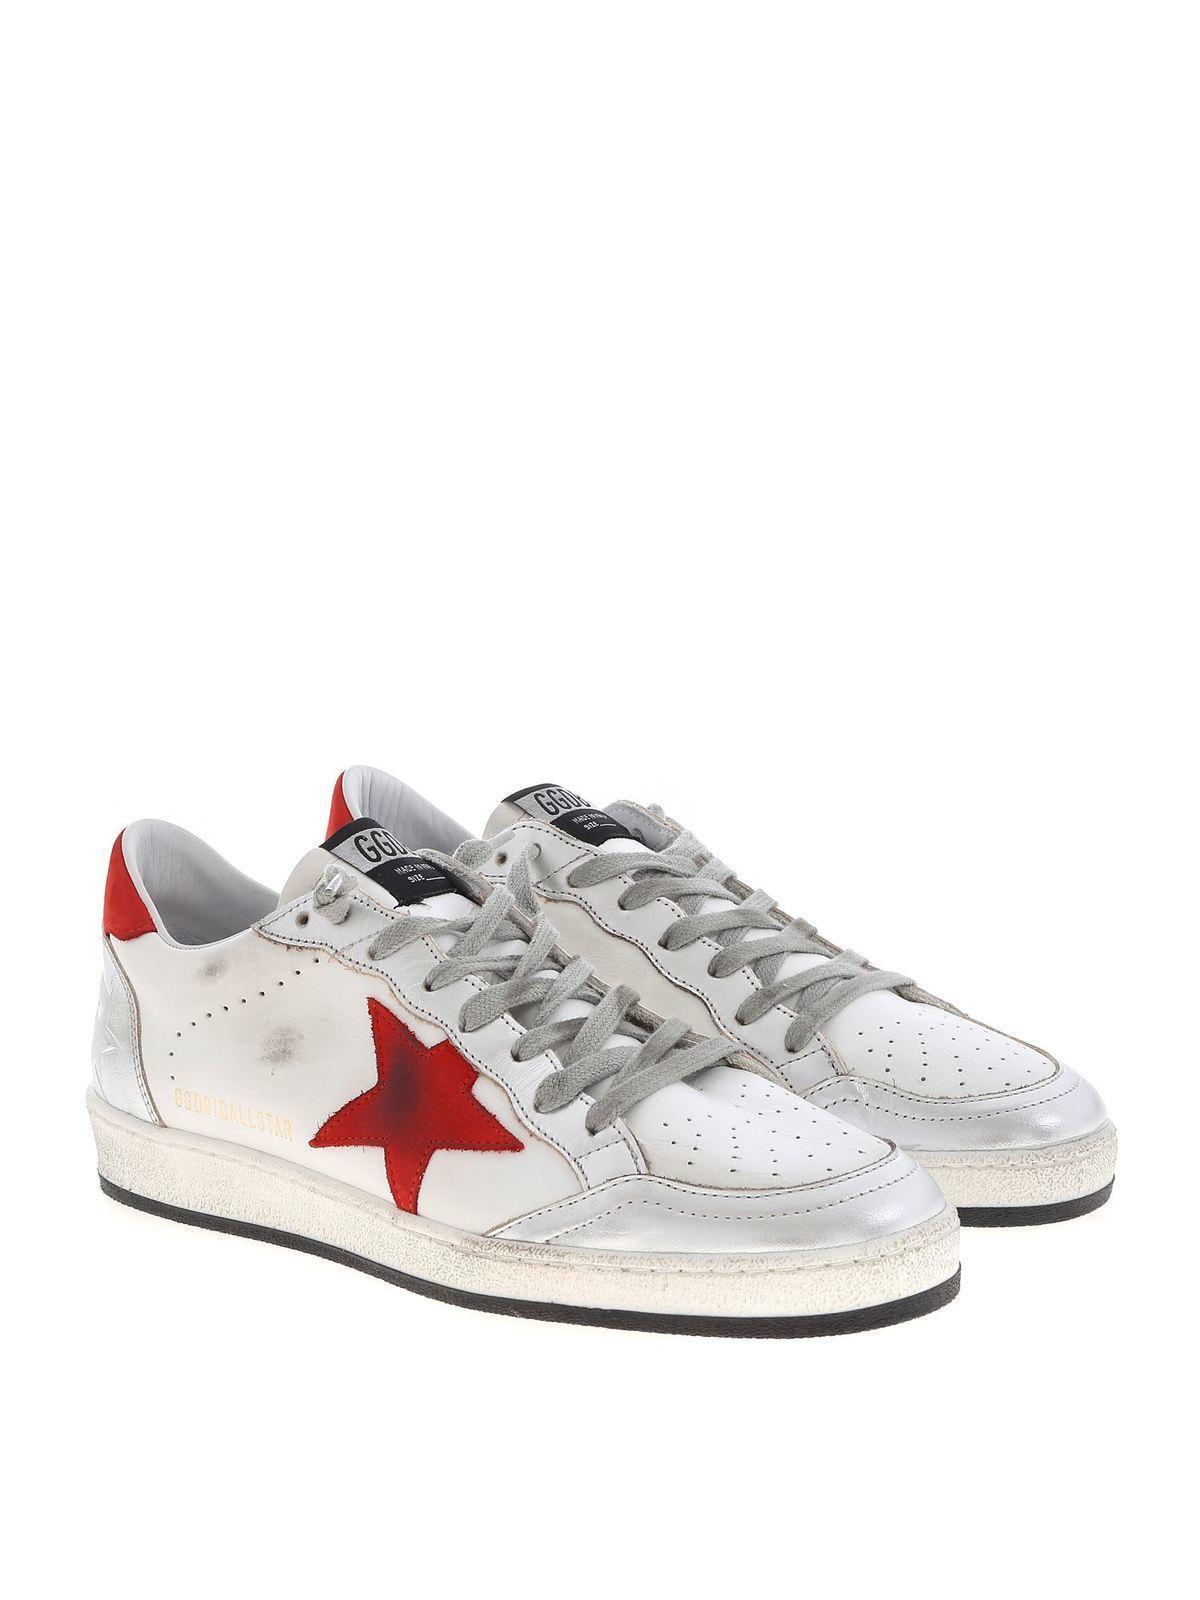 Golden Goose - Ball Star sneakers in